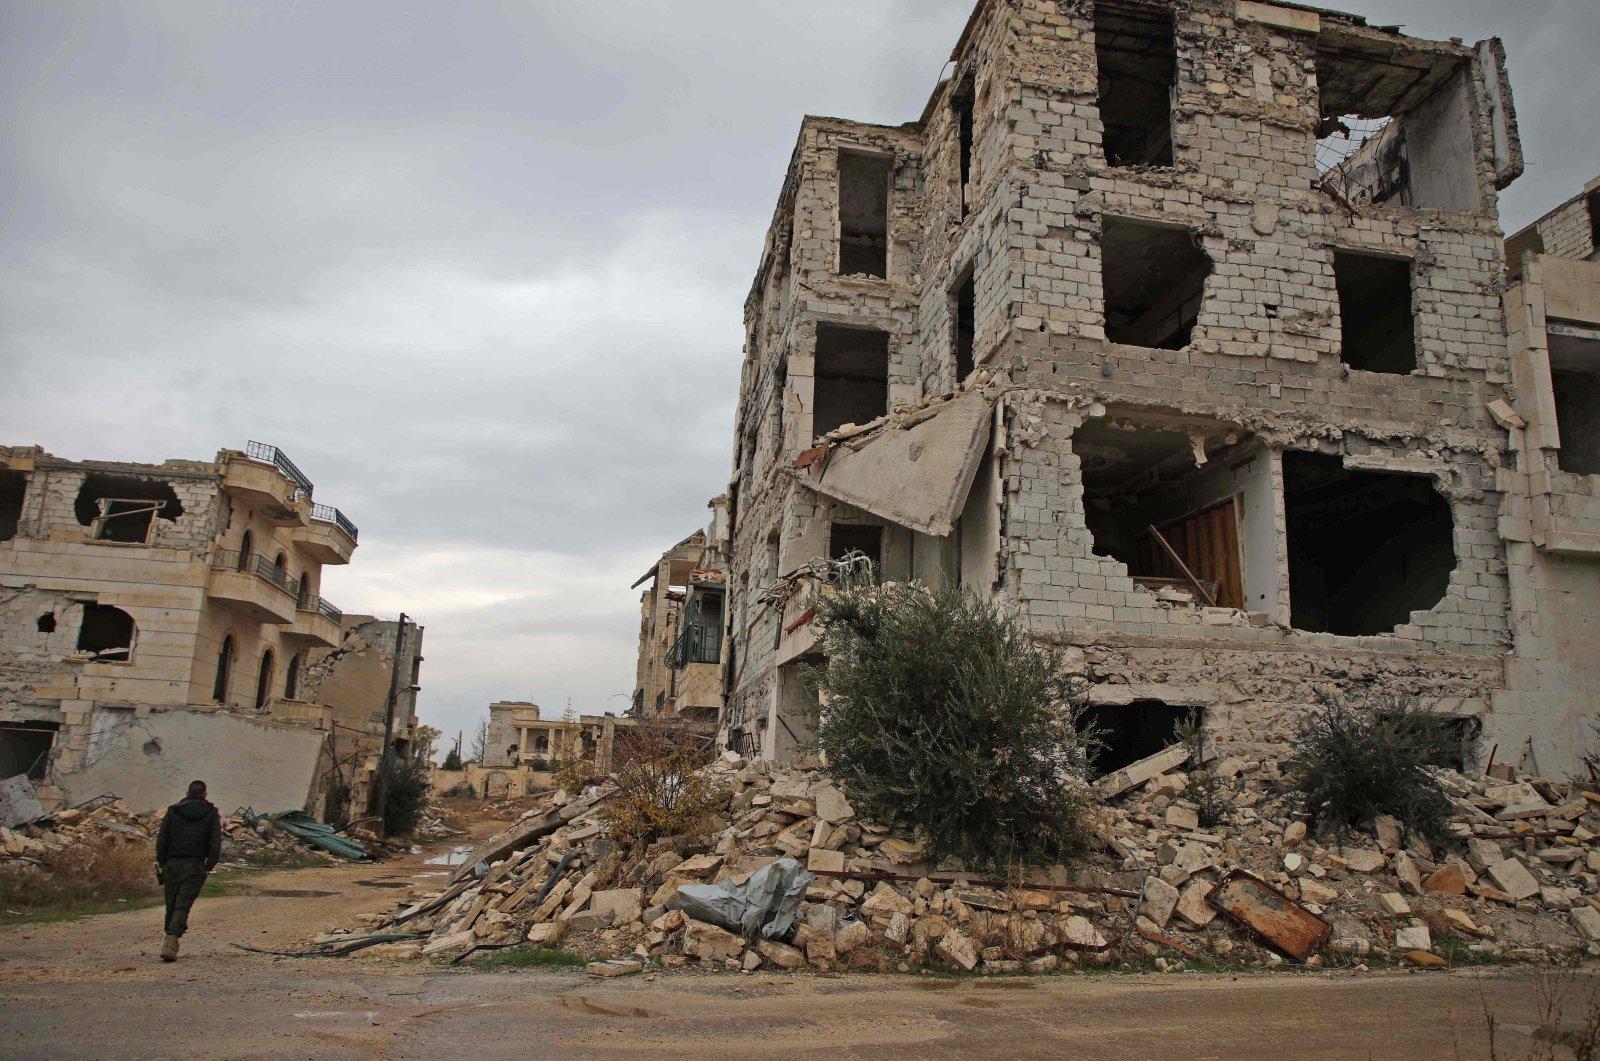 A damaged building in the Syrian opposition-held Al-Rashidin district of western Aleppo's countryside near Idlib province, Nov. 26, 2018. (AFP)